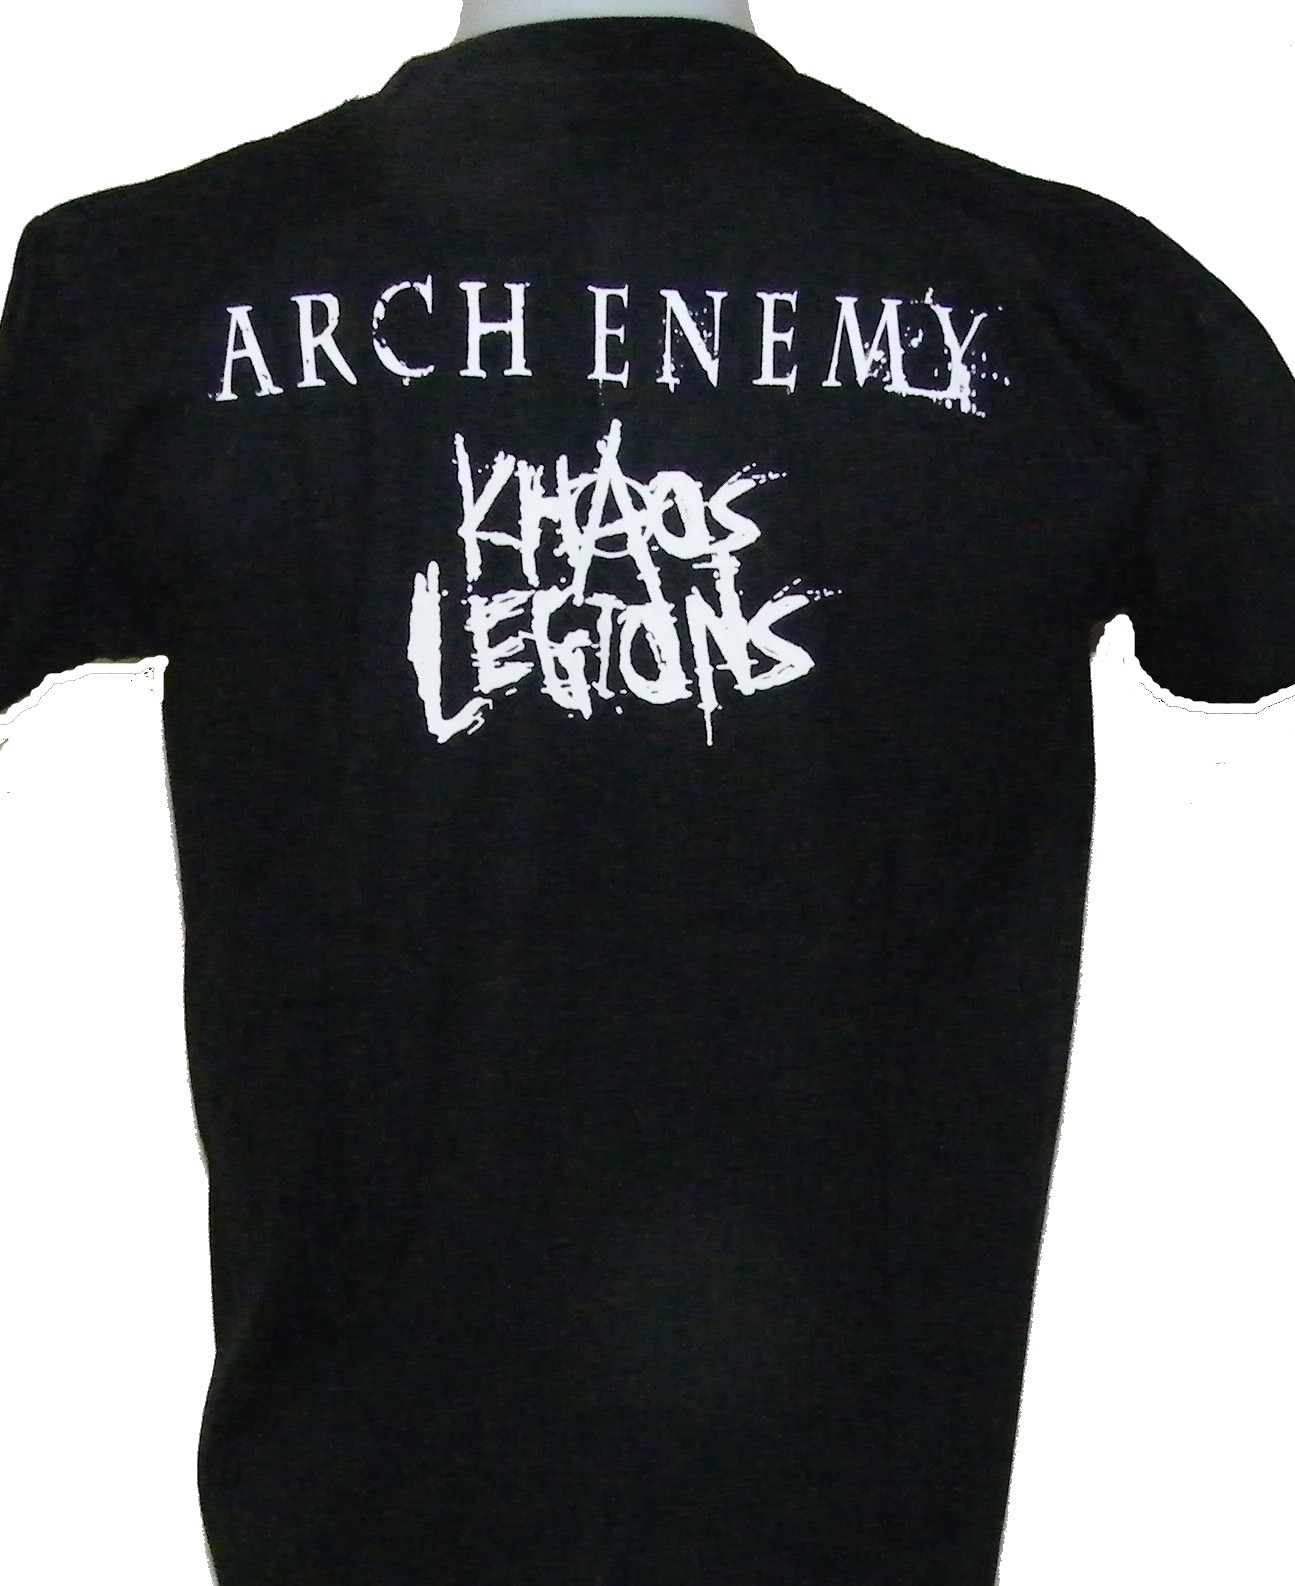 dd4bc0820 Arch Enemy t-shirt Khaos Legions size M – RoxxBKK